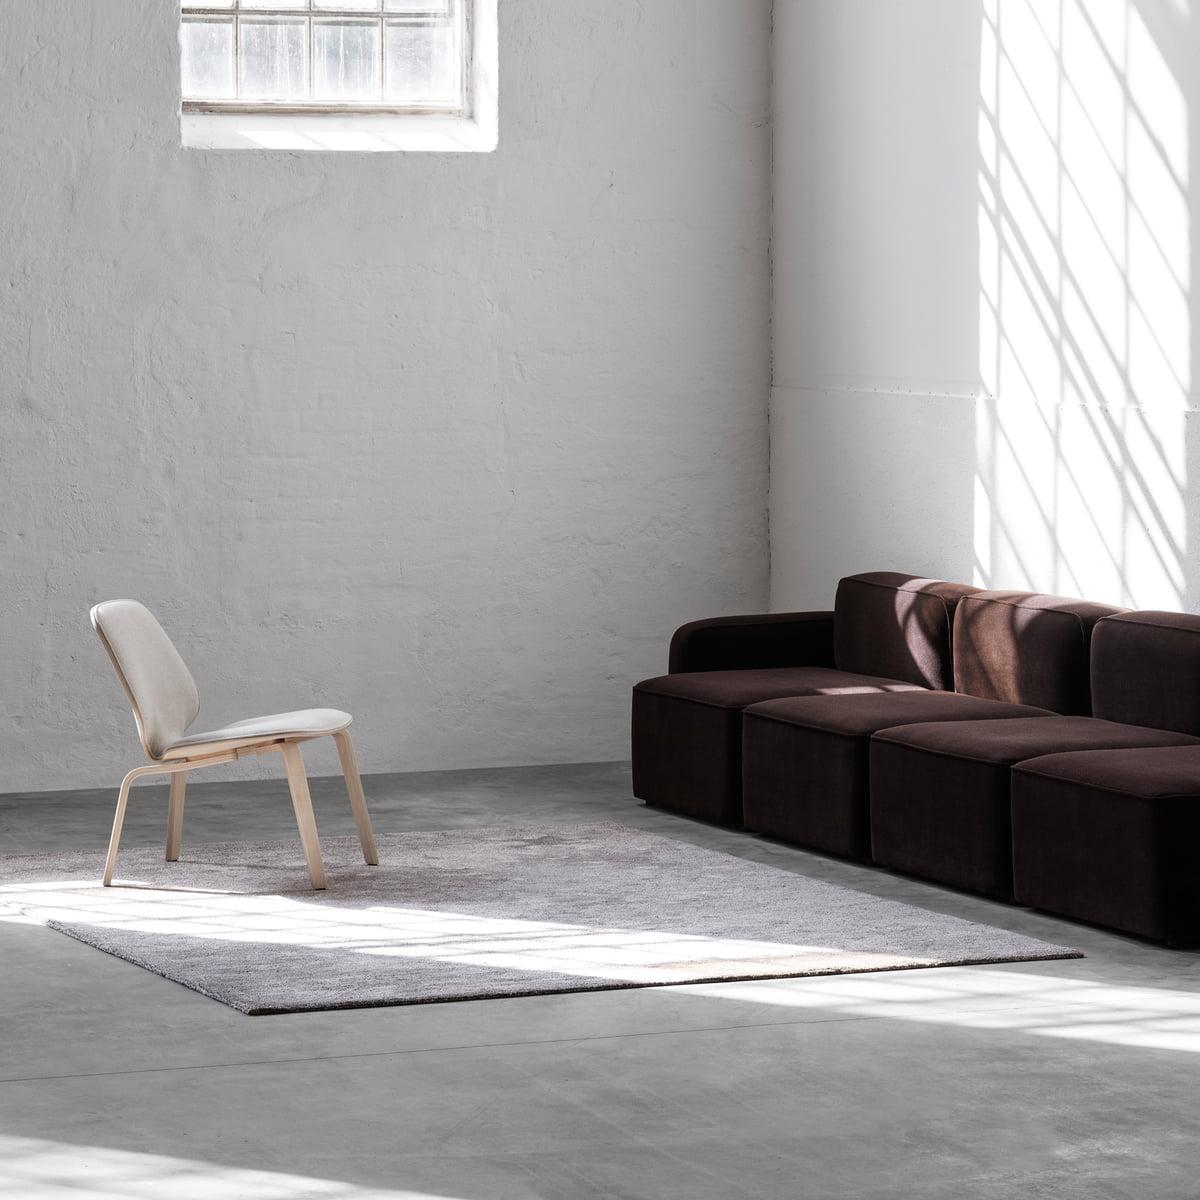 Awesome Normann Copenhagen My Chair Lounge Birke Alphanode Cool Chair Designs And Ideas Alphanodeonline